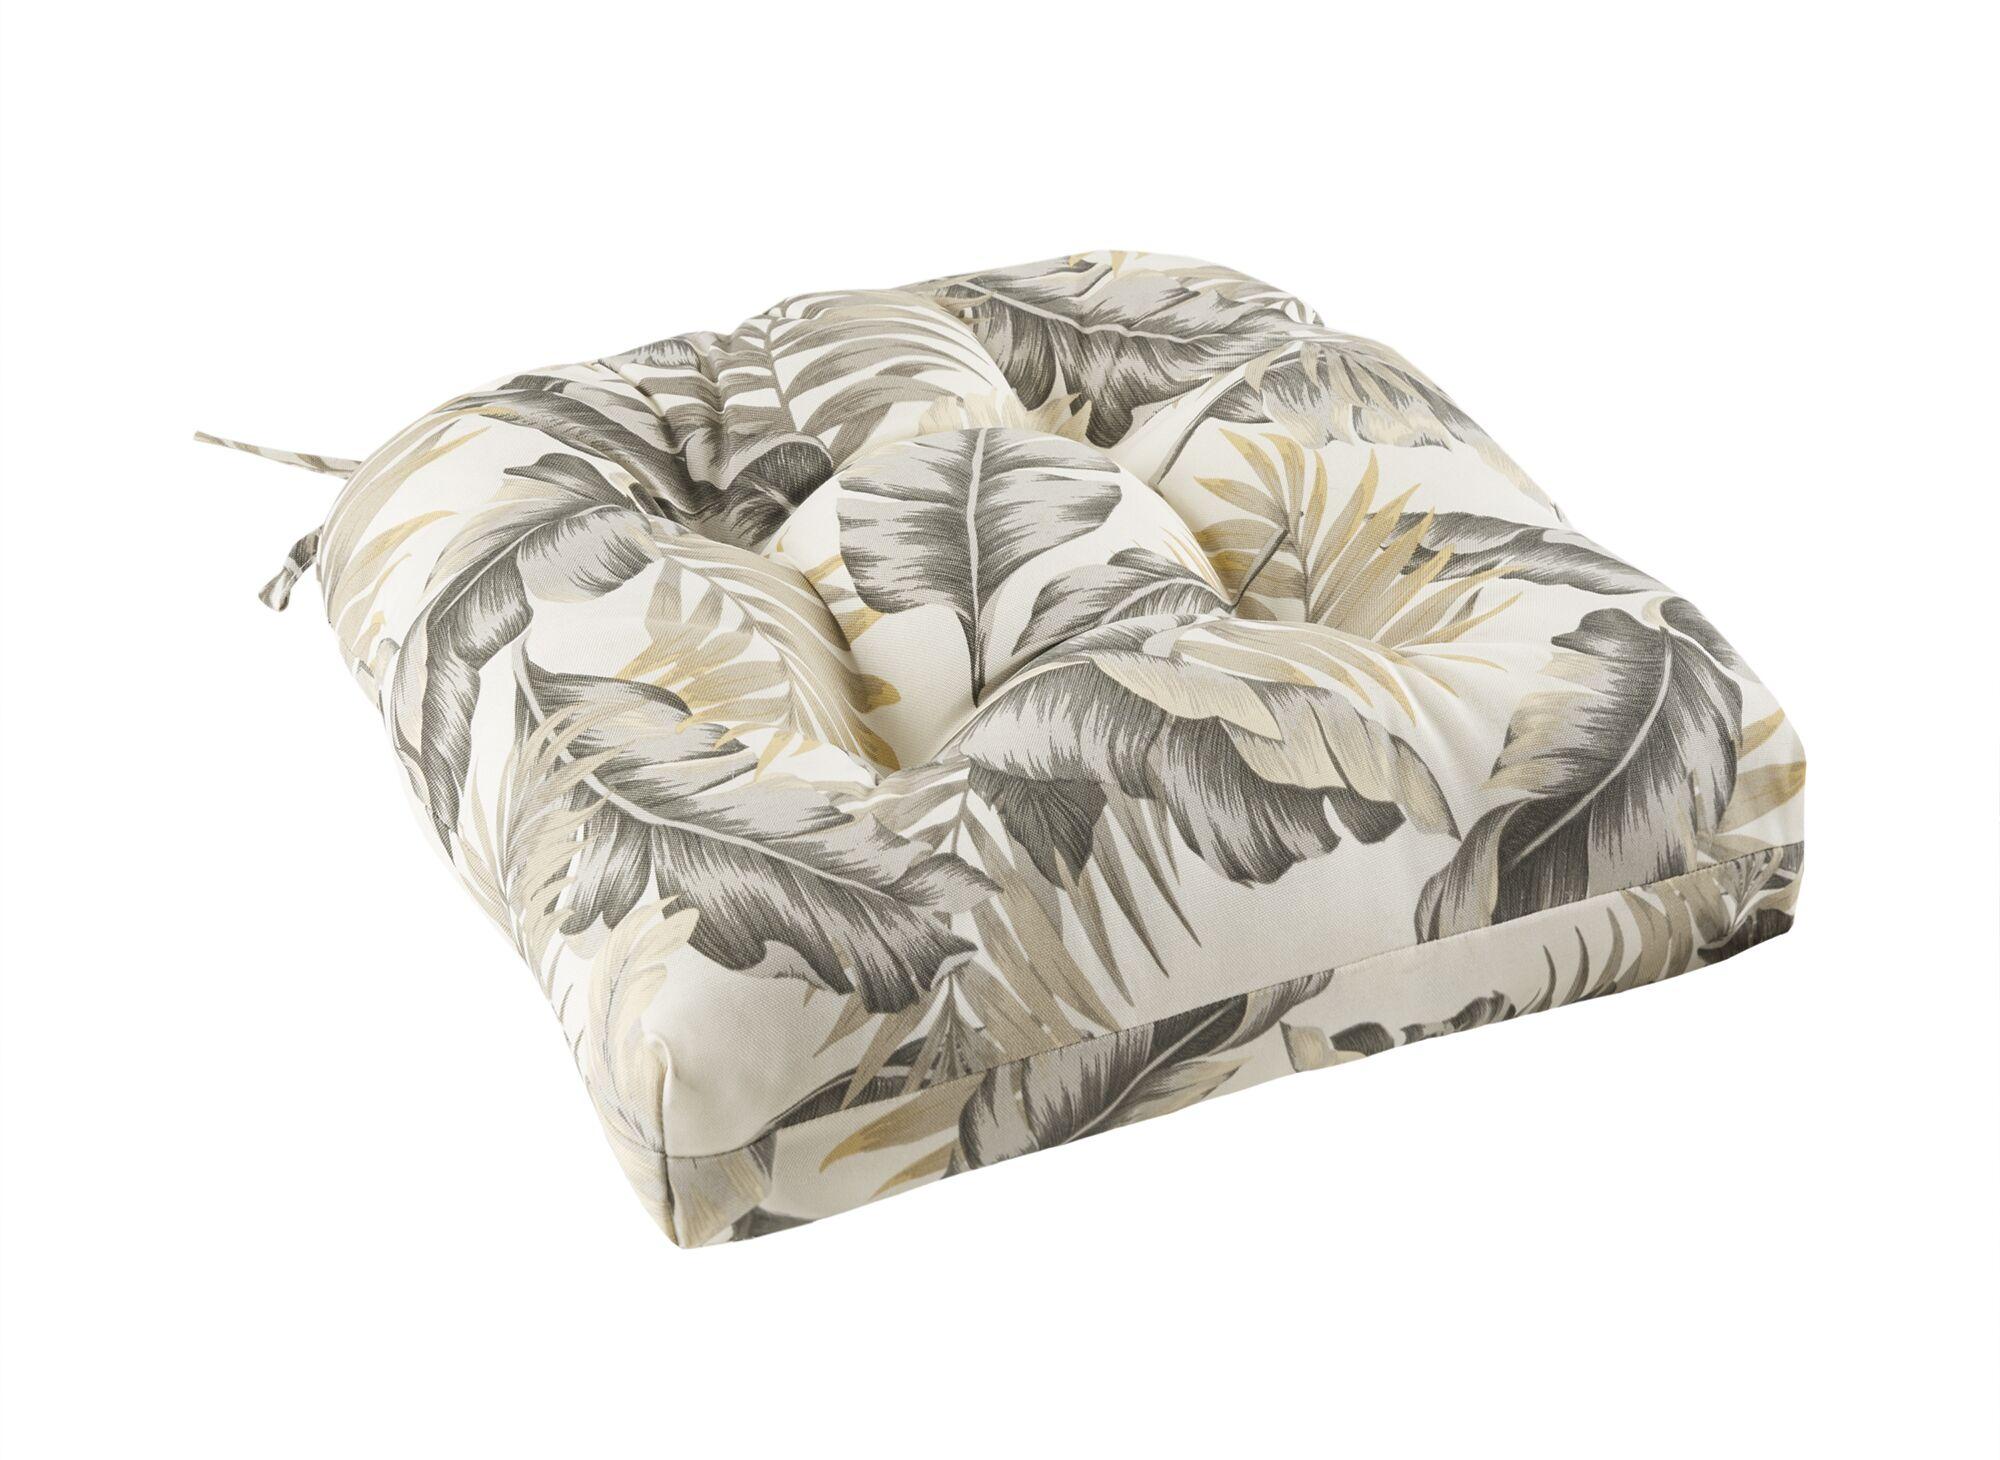 Swiger Leaf 3M Scotchgard Outdoor Dining Chair Cushion Fabric: Neutral